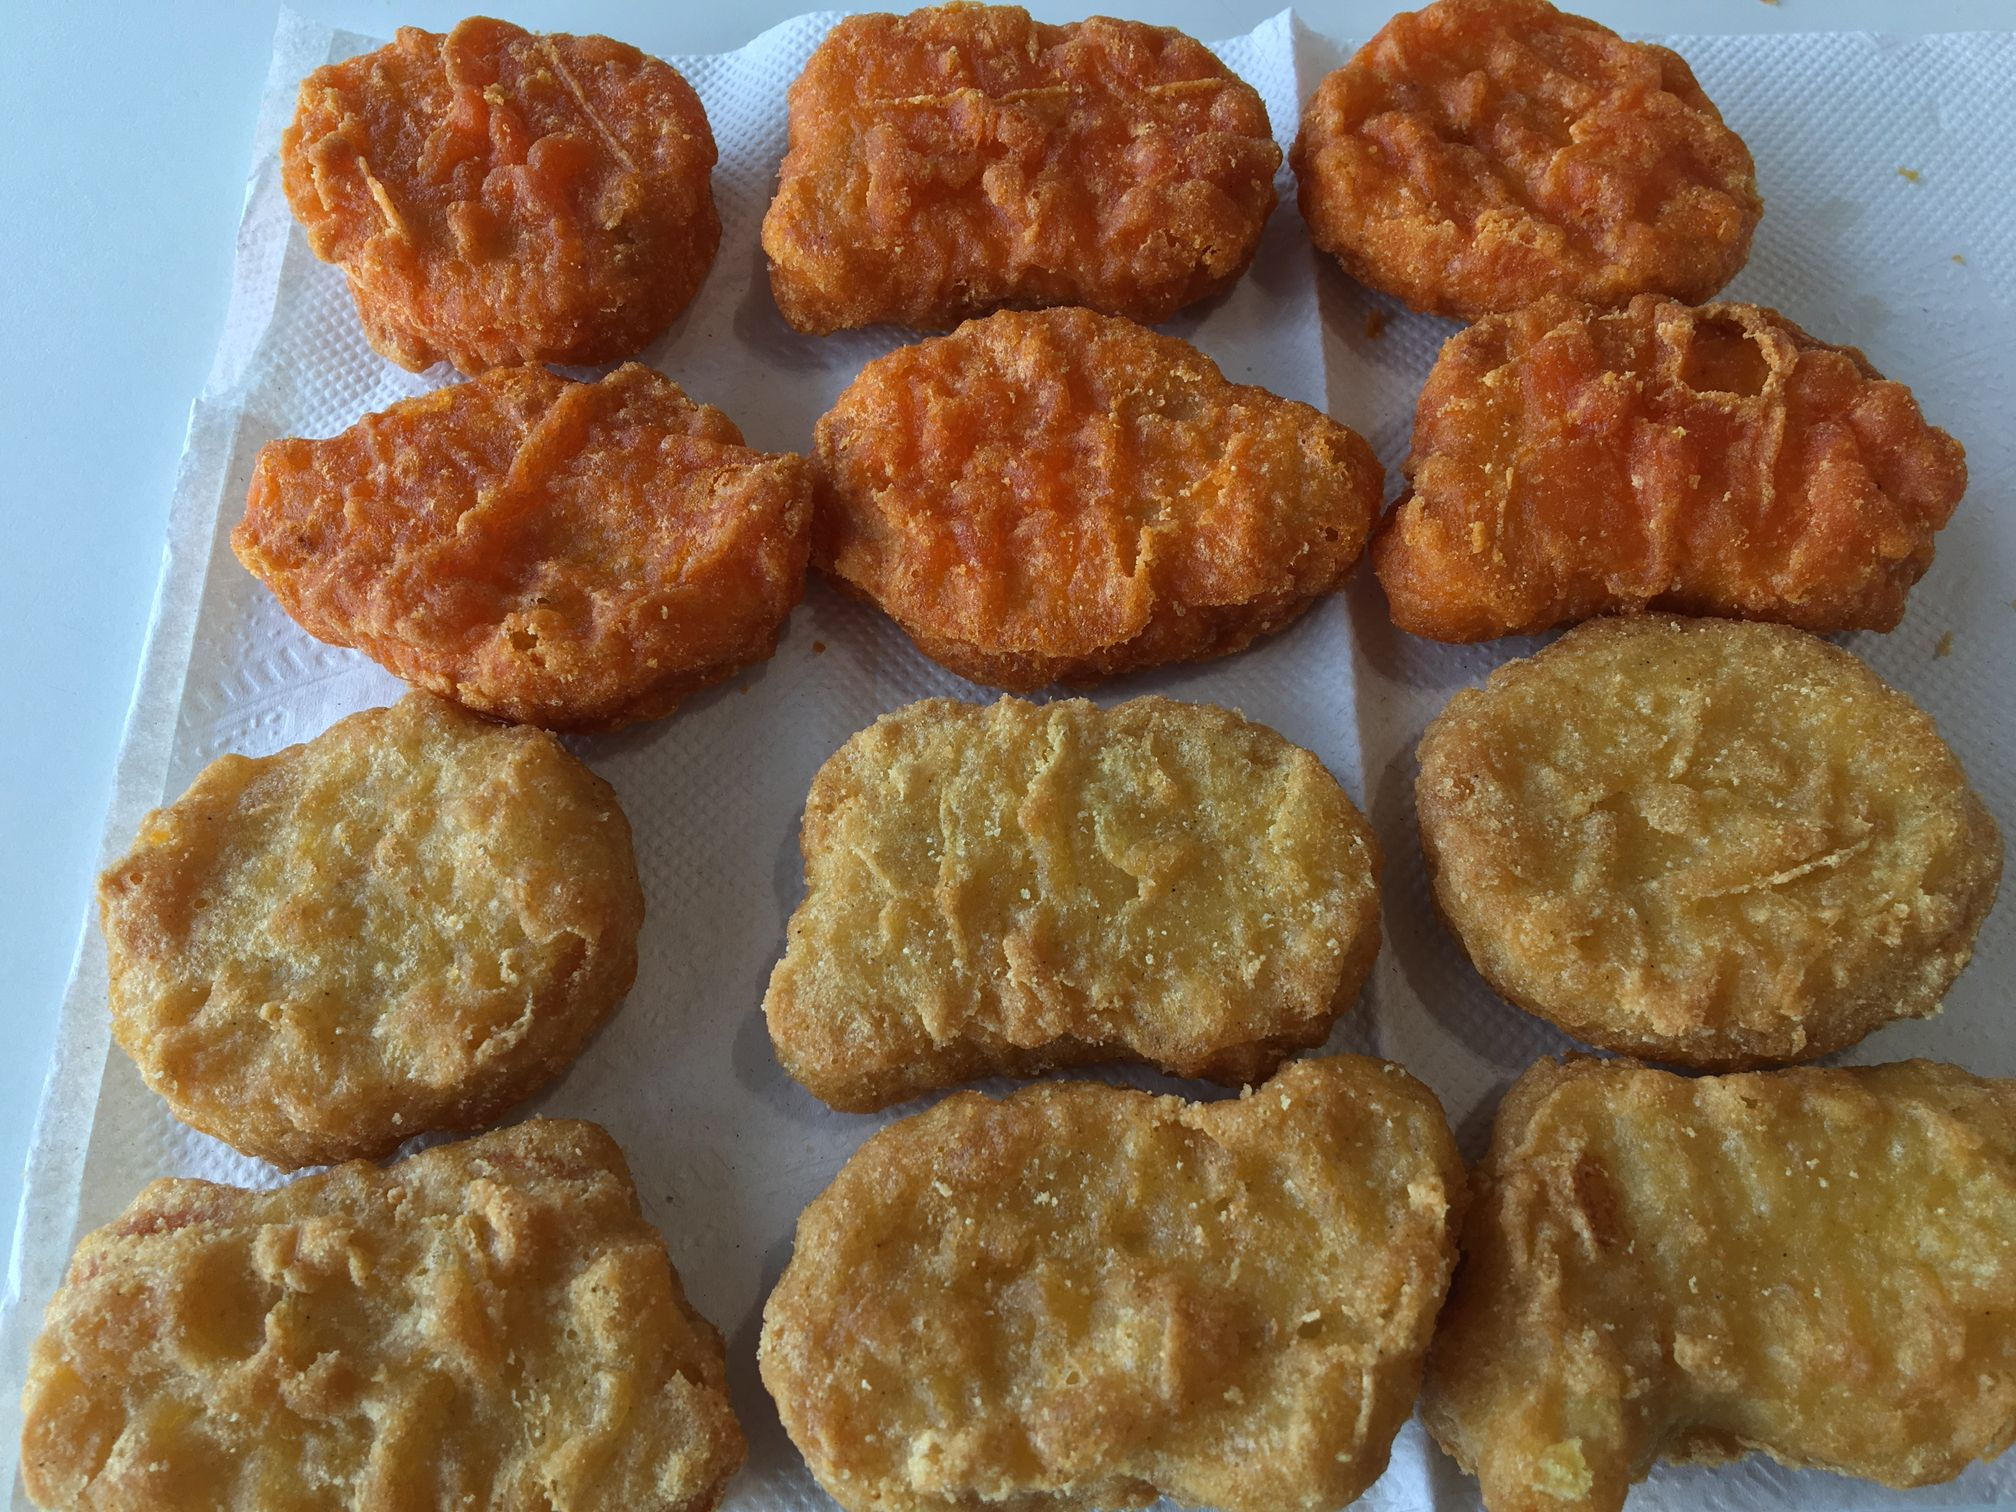 McDonald's Spicy Chicken McNuggets